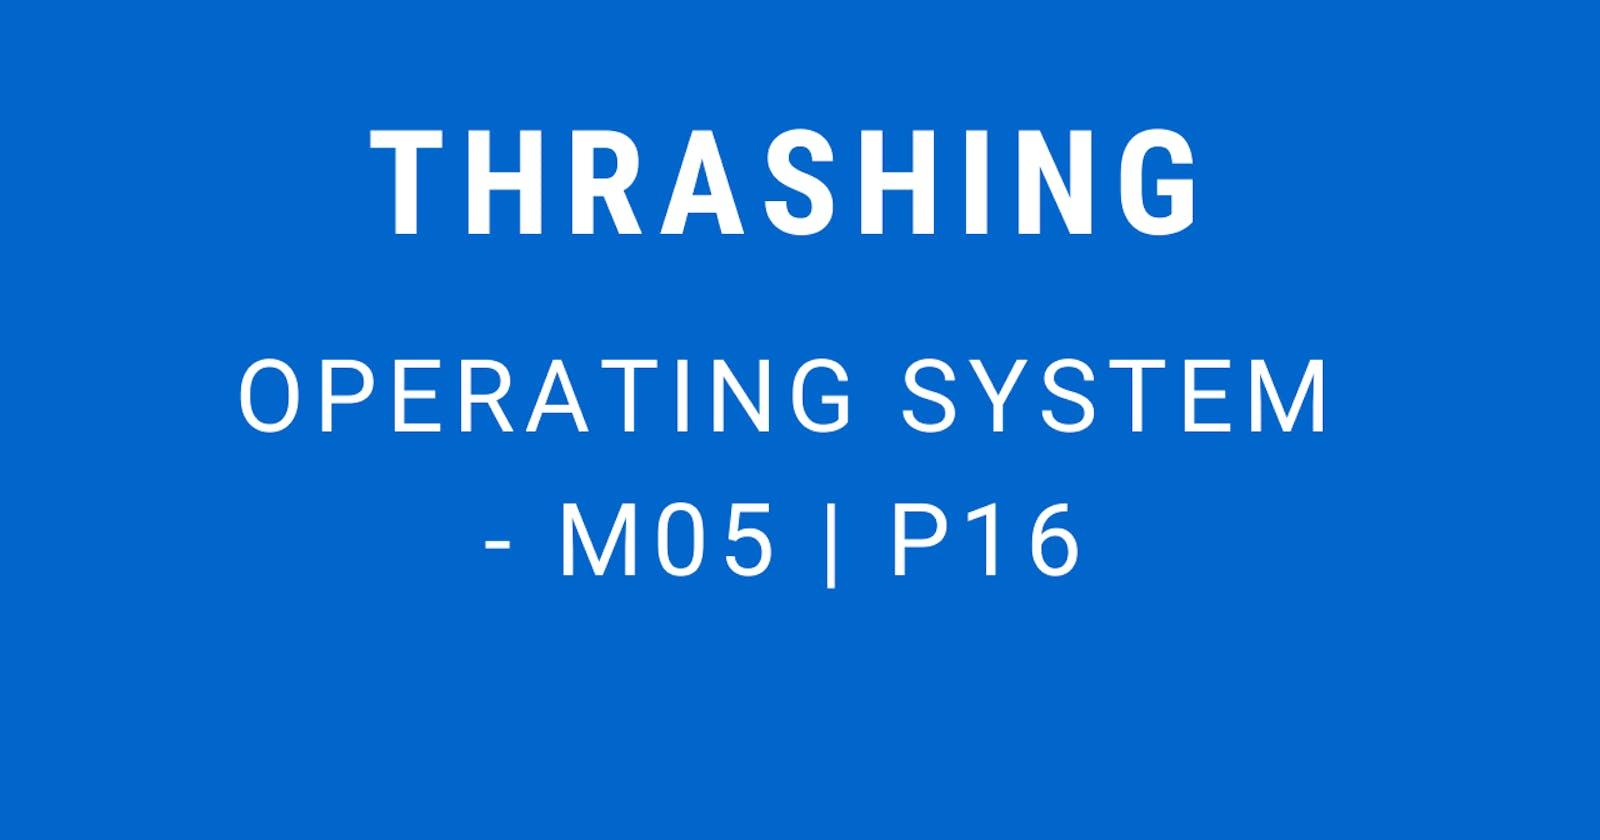 Thrashing | Operating System - M05 P16